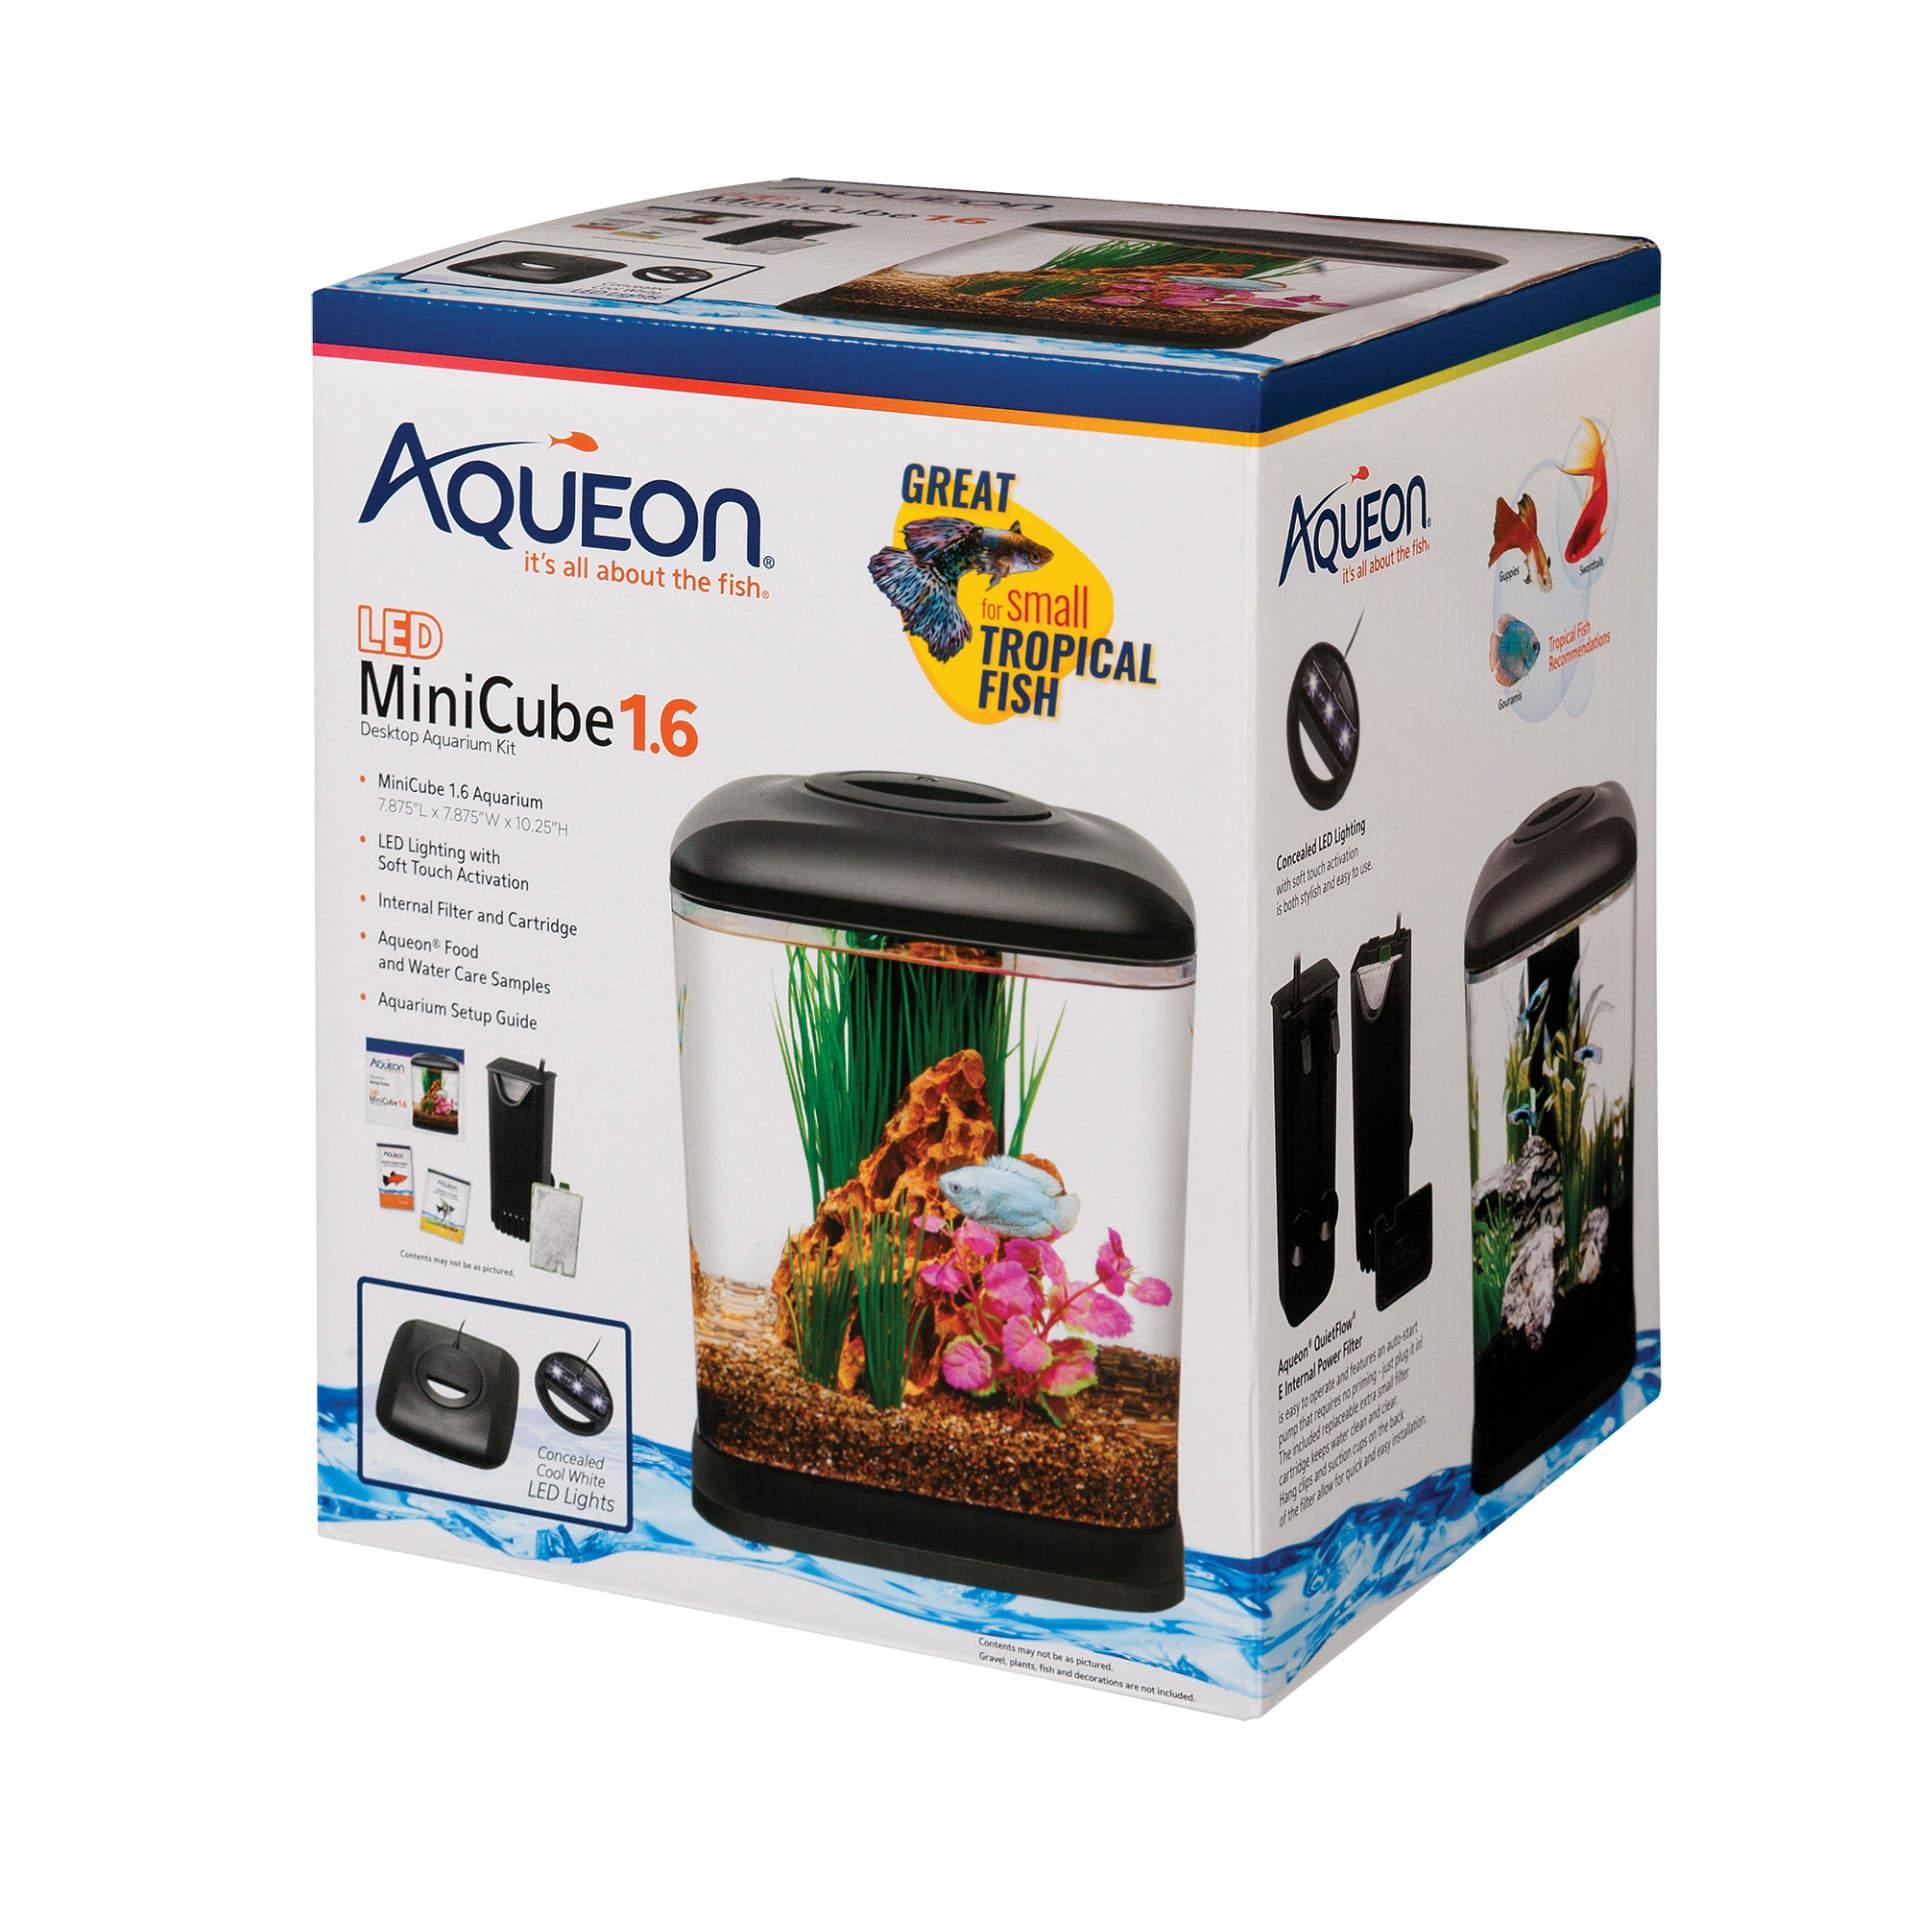 Aqueon MiniCube LED Desktop Aquarium Kit, 1.6-gallon